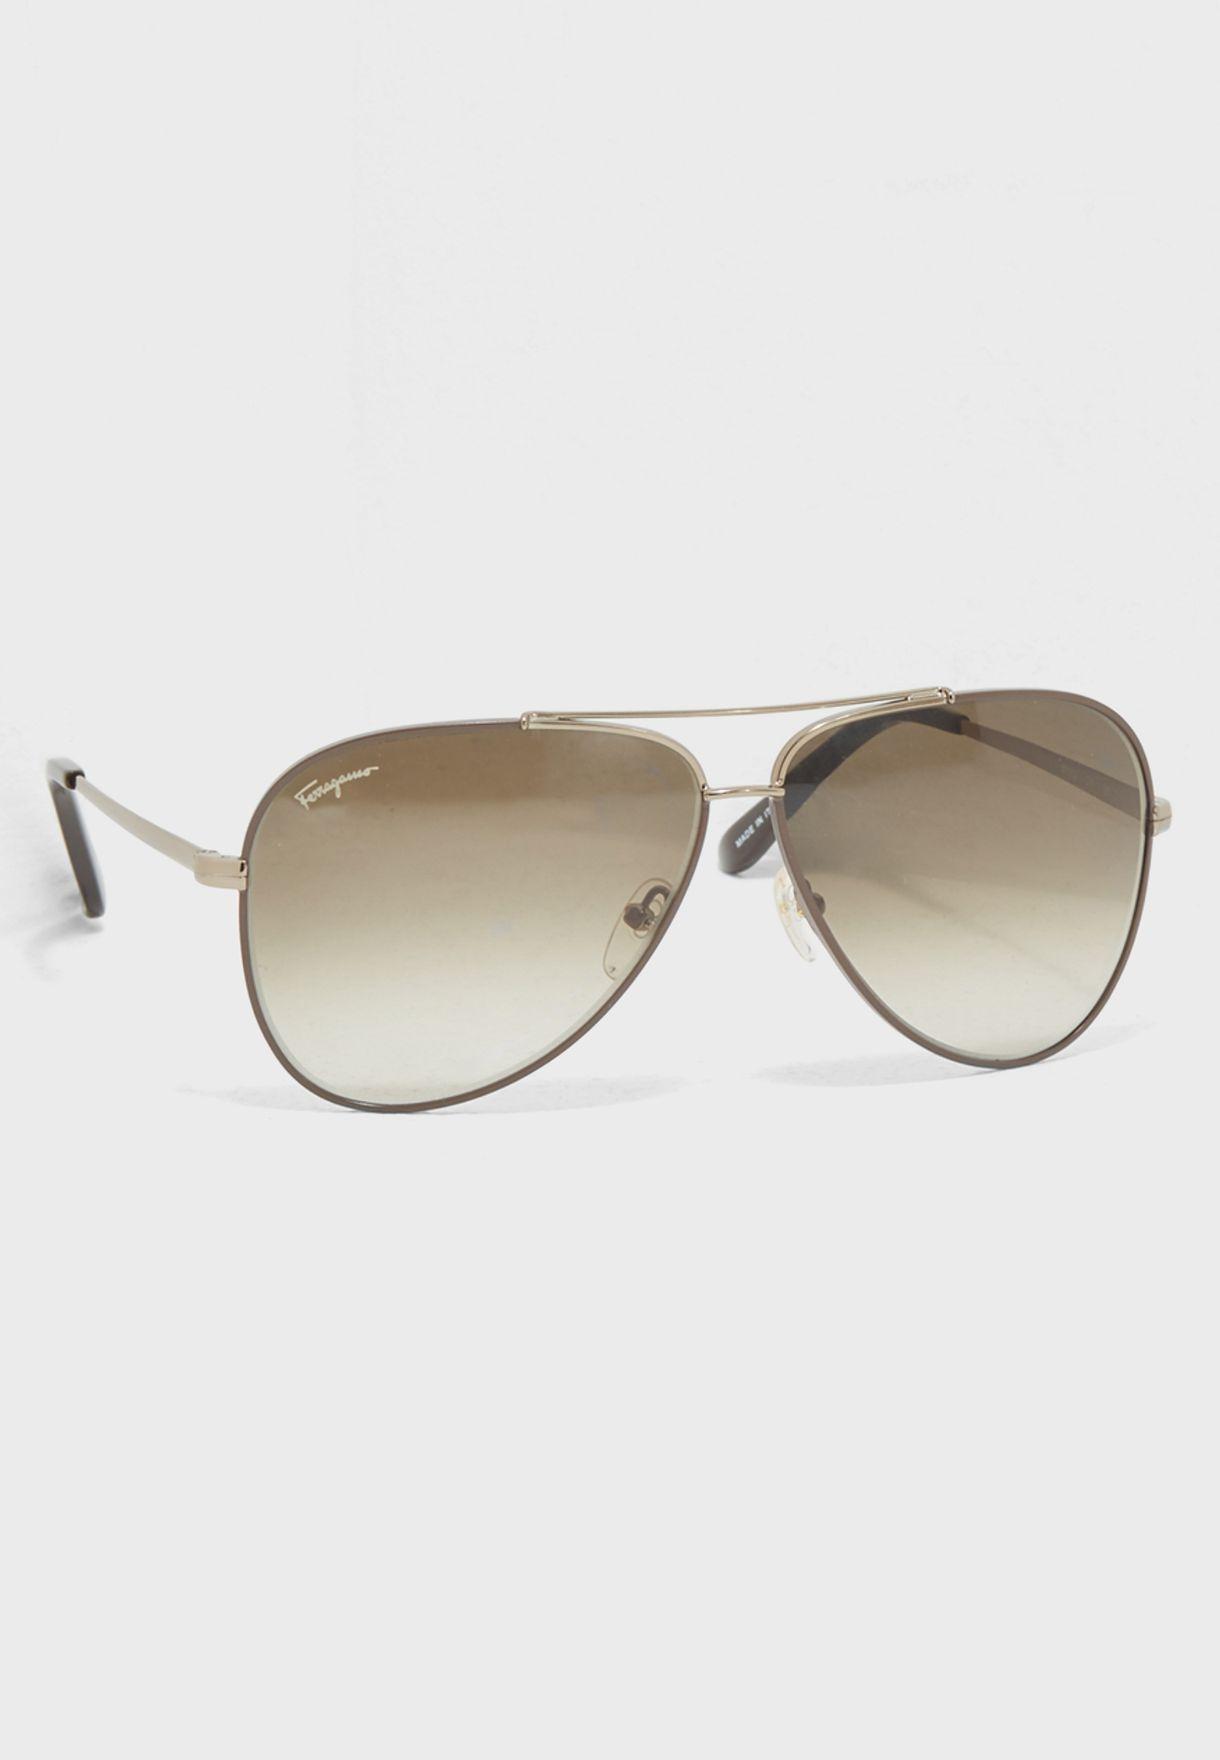 7cce267c7e7 Shop Salvatore ferragamo browns Aviator Sunglasses SF131S for Men in Kuwait  - SA277AC06IIJ